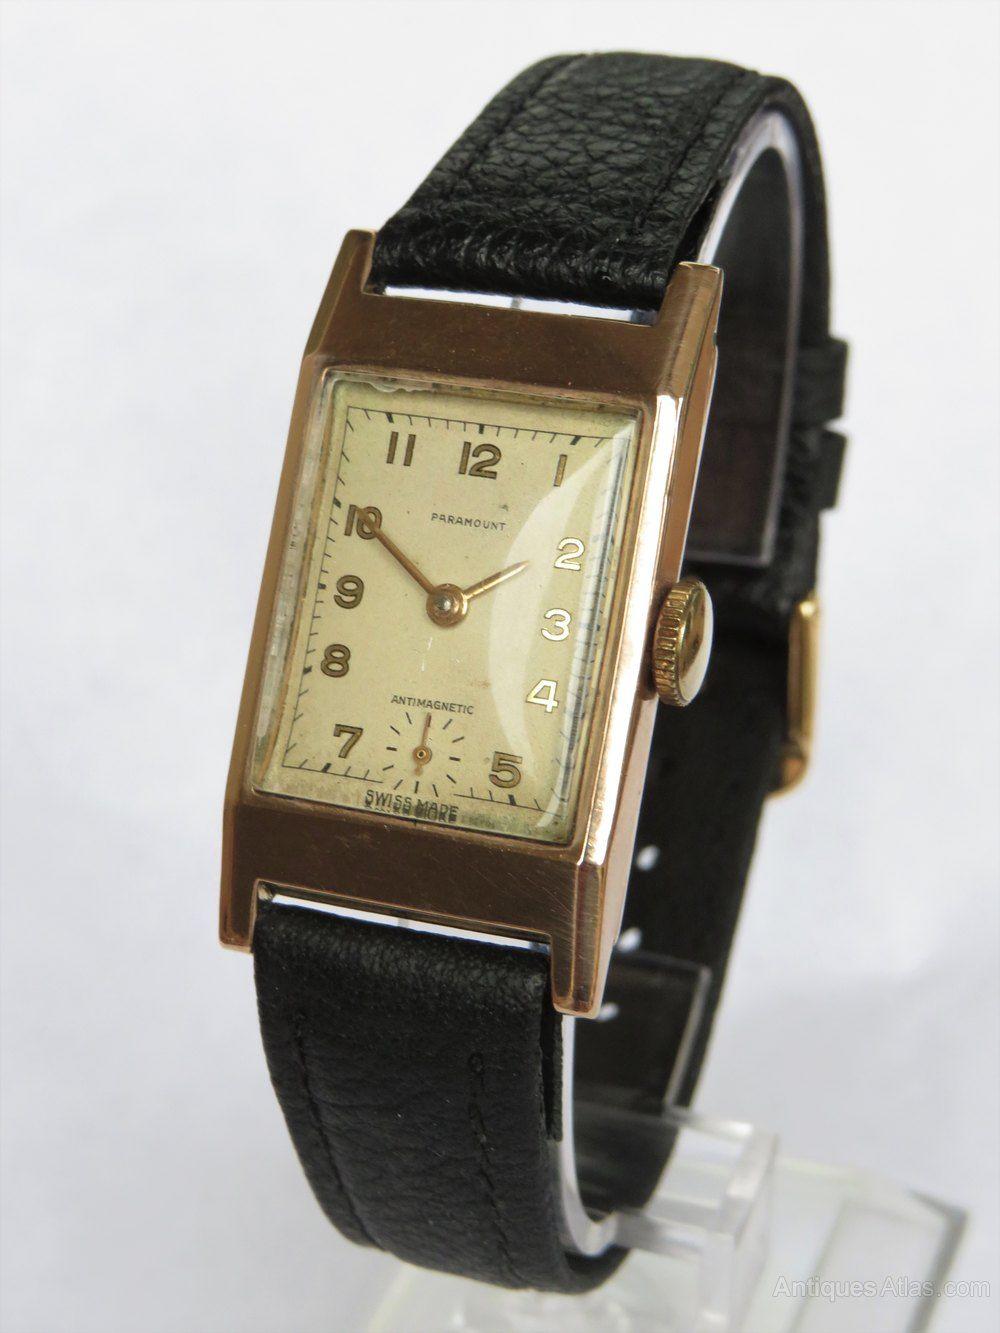 Antiques atlas gents 9ct gold paramount art deco wrist